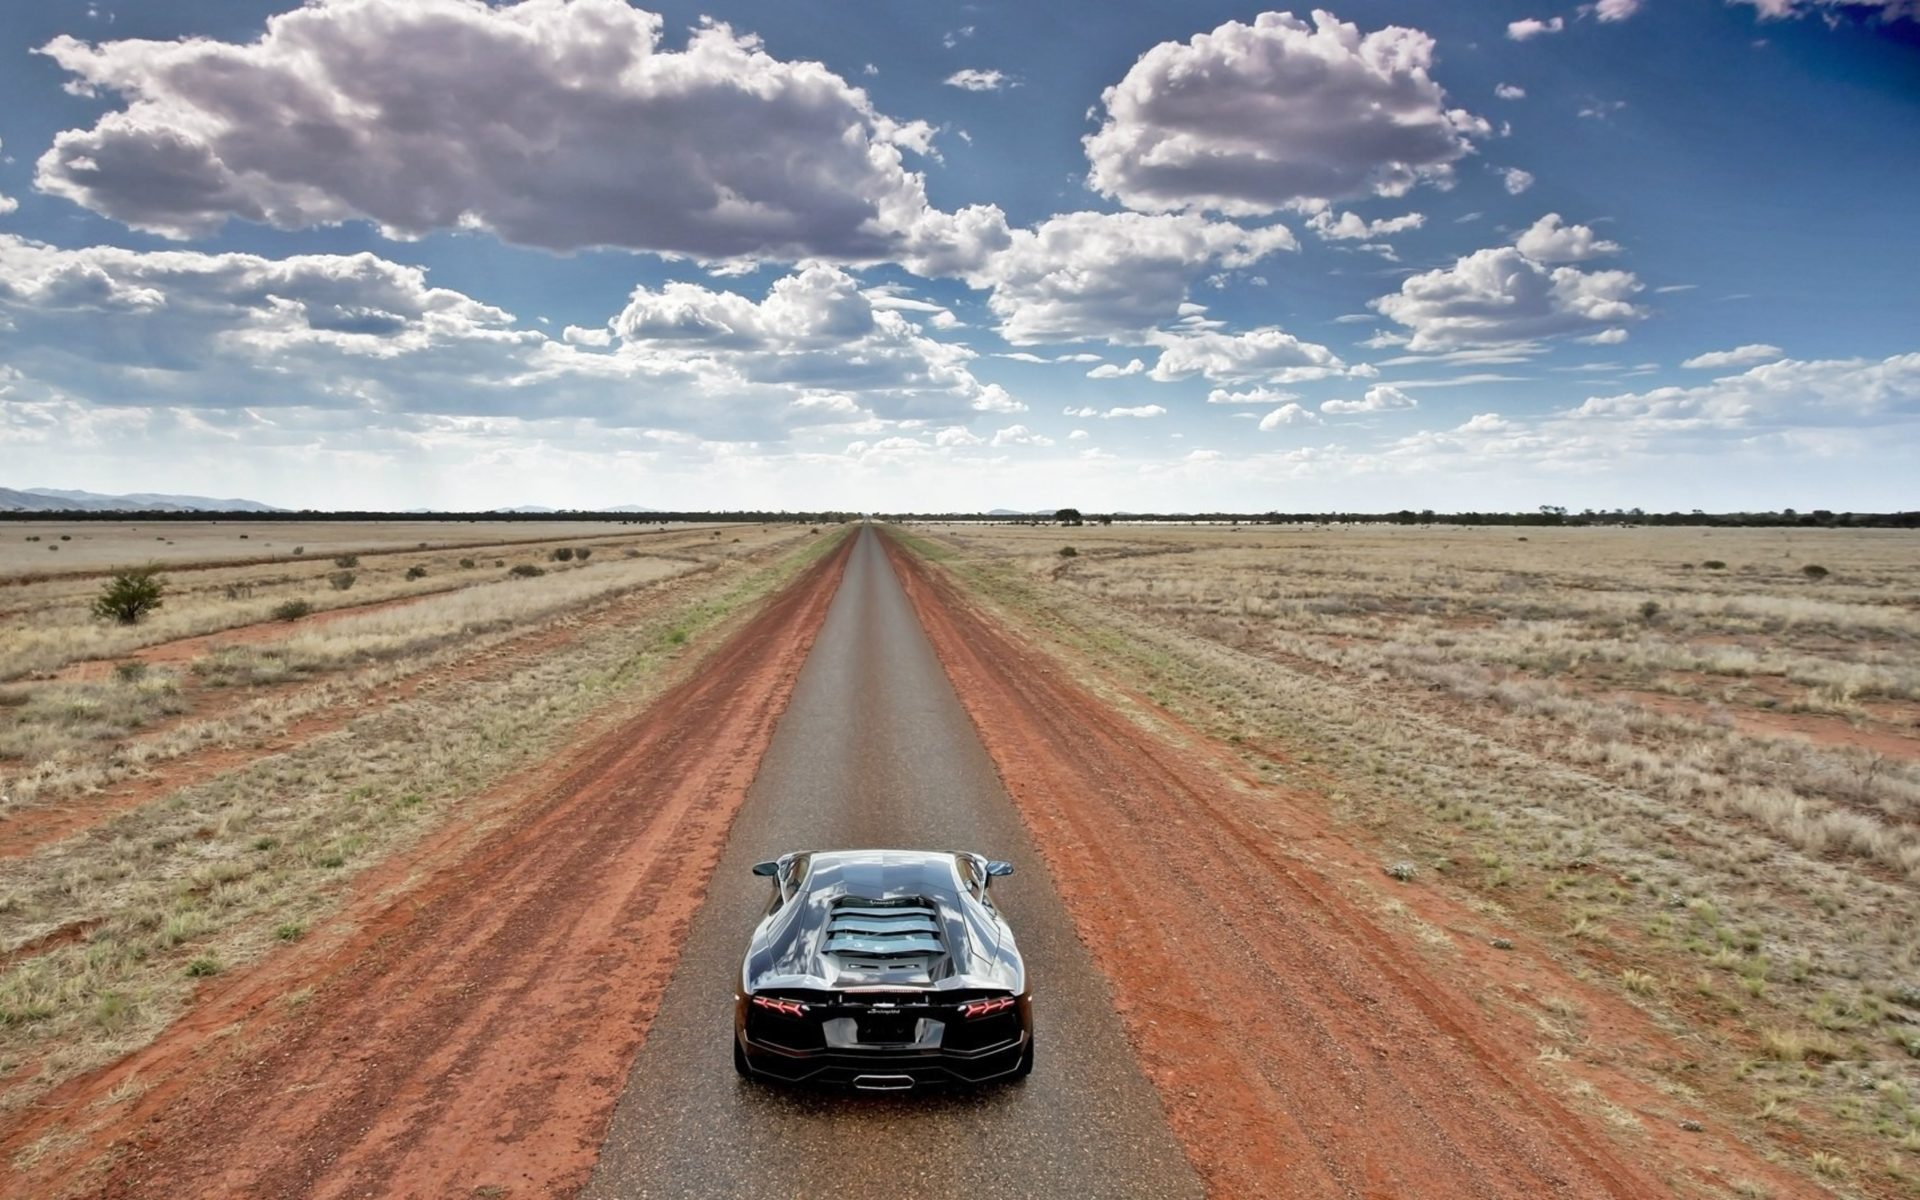 Wallpaper Ferrari Iphone 5 Lamborghini Aventador On Empty Country Road Wide